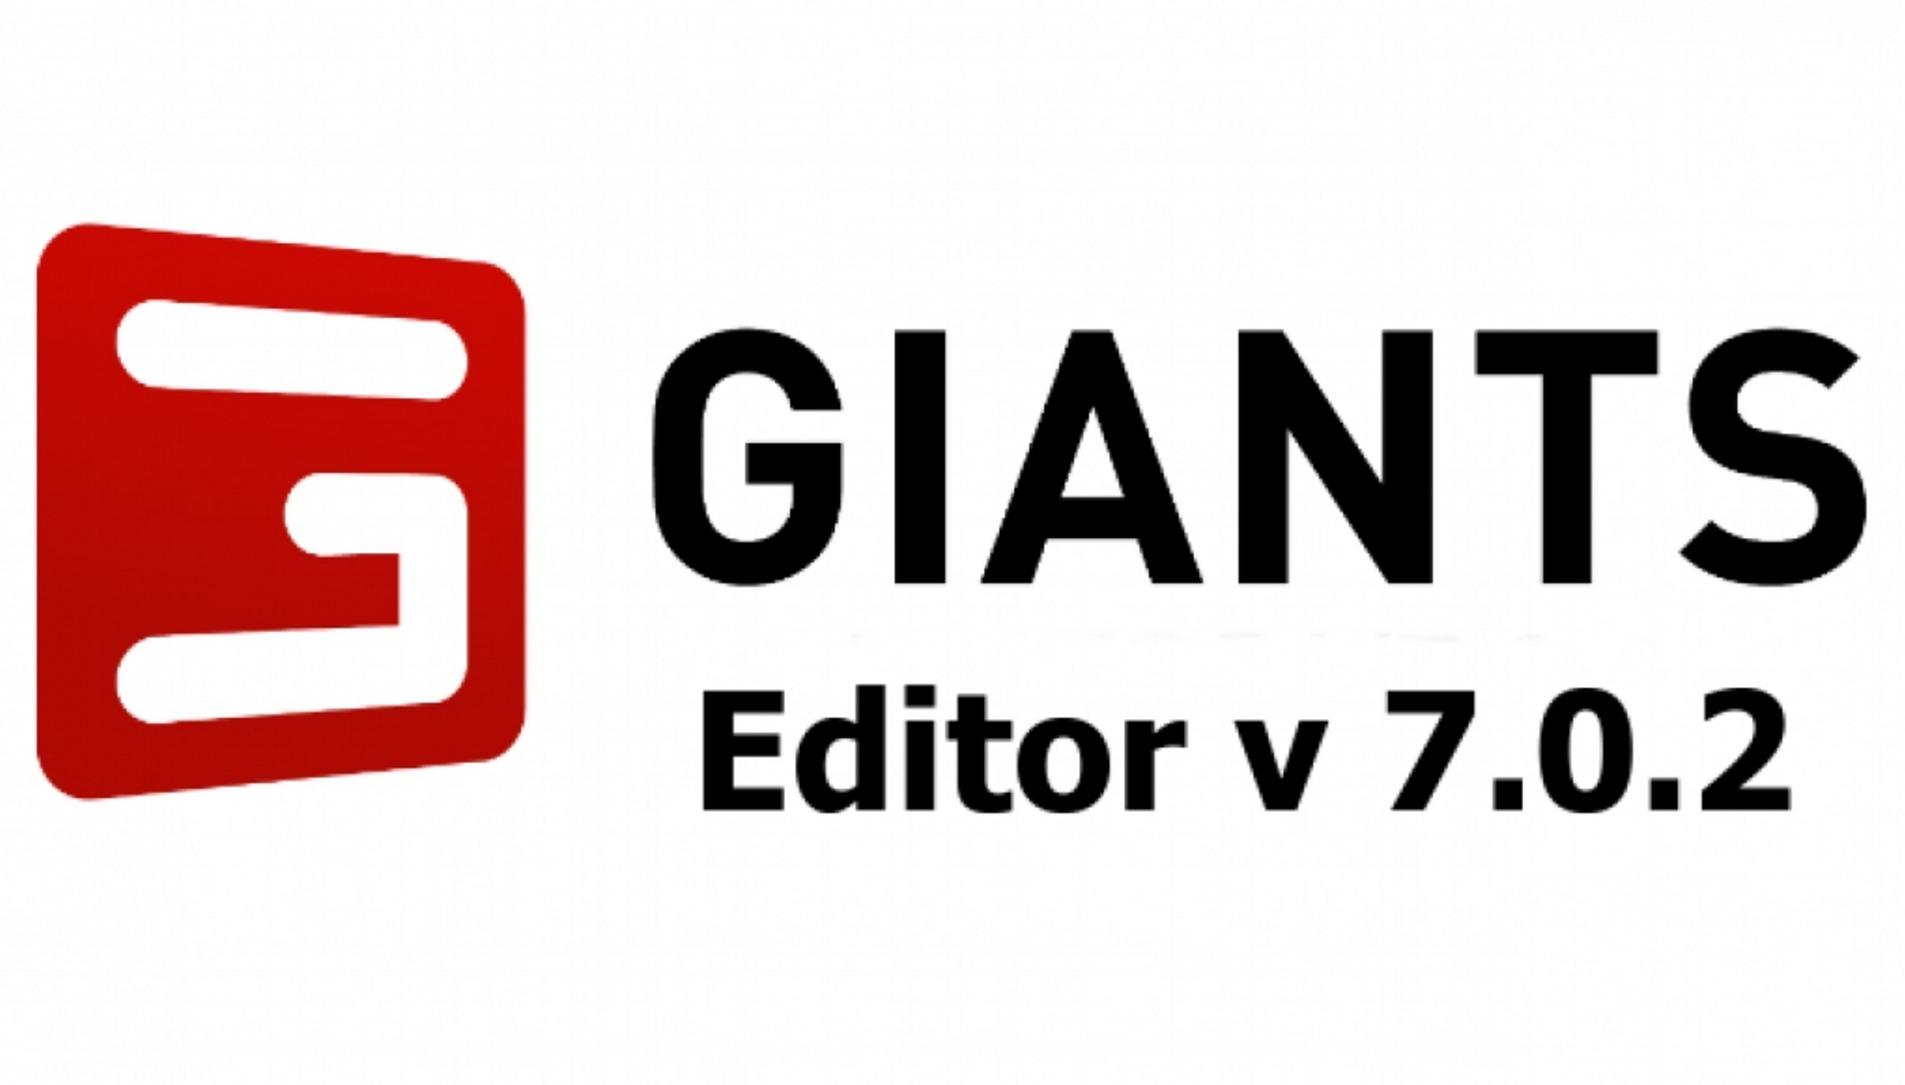 GIANTS Editor v 7 0 2 64bit - Farming simulator 2019 / 2017 / 2015 Mod